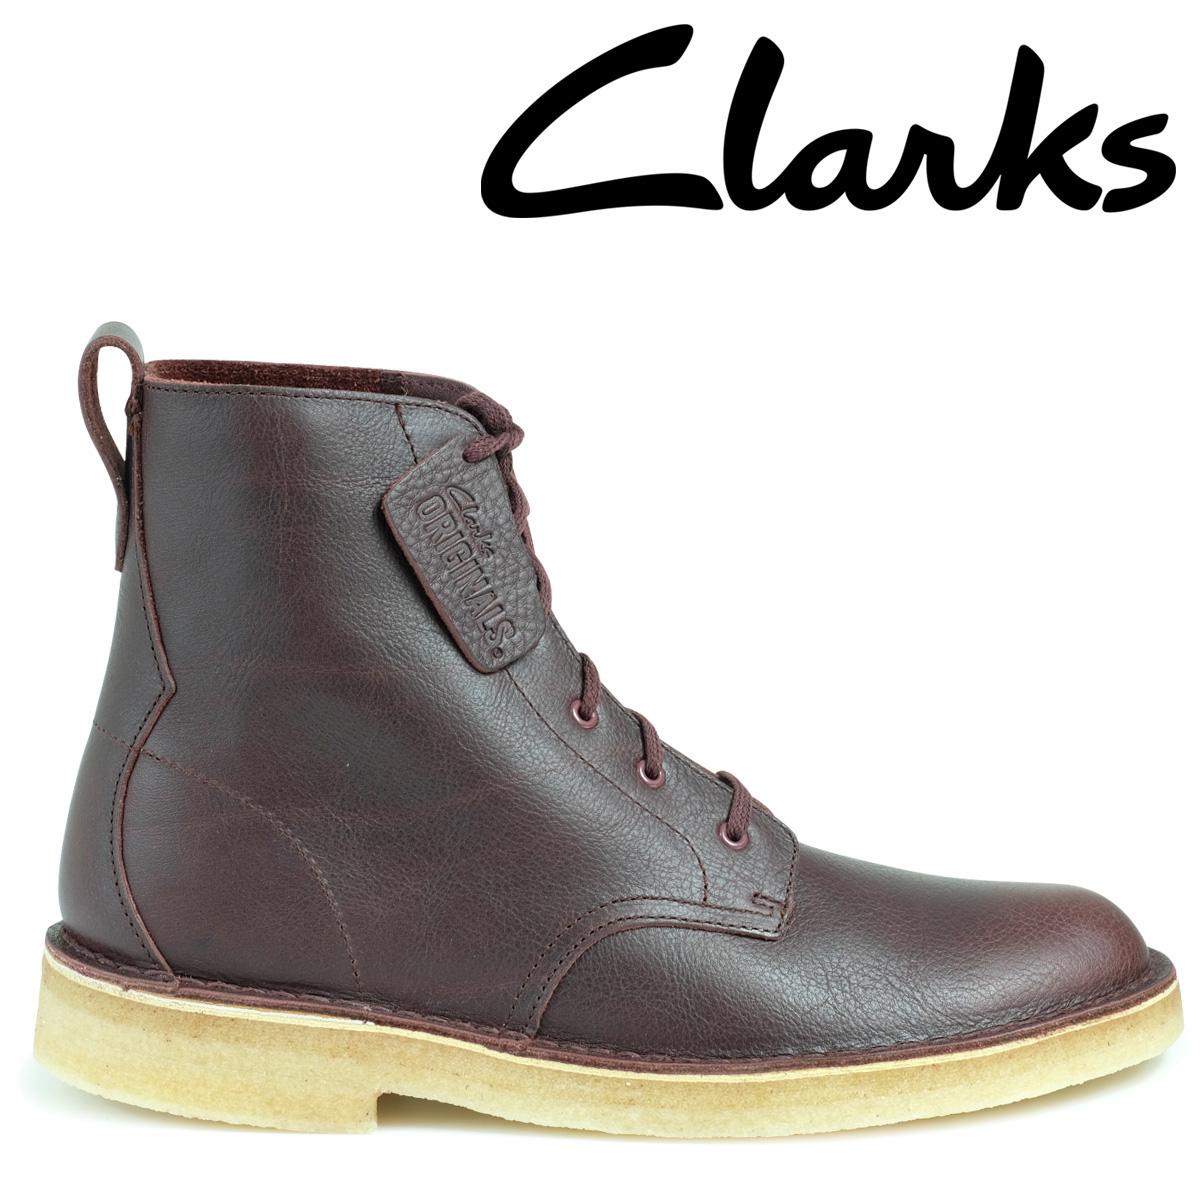 Clarks デザート マリ ブーツ クラークス メンズ DESERT MALI 26126186 靴 バーガンディー